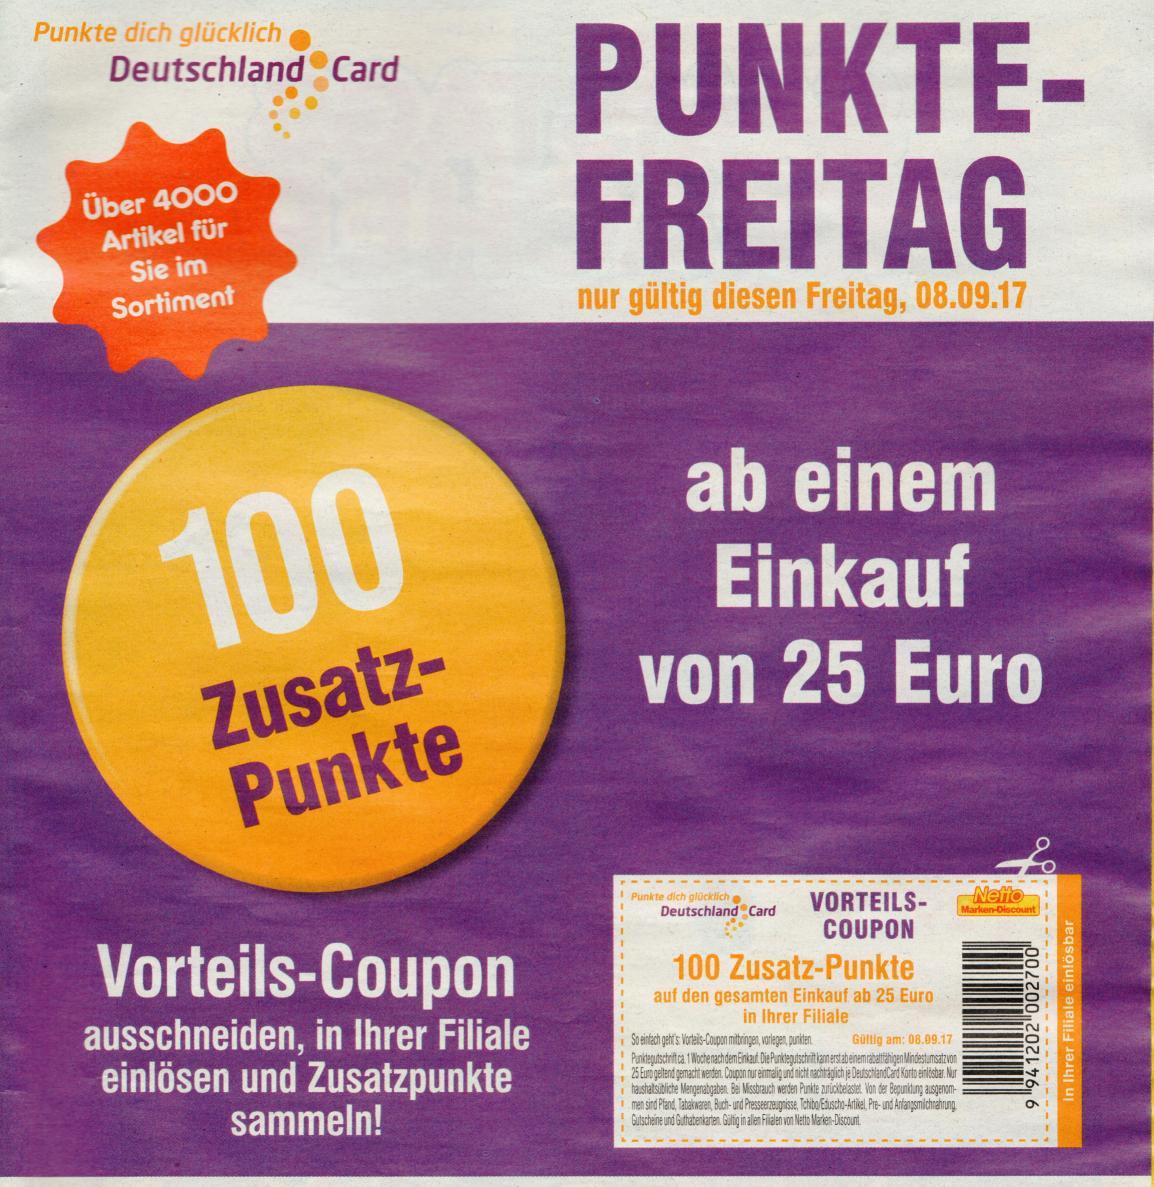 100 DC-Coupon im Prospekt ab 25€ Einkaufwert bei Netto MD am Freitag